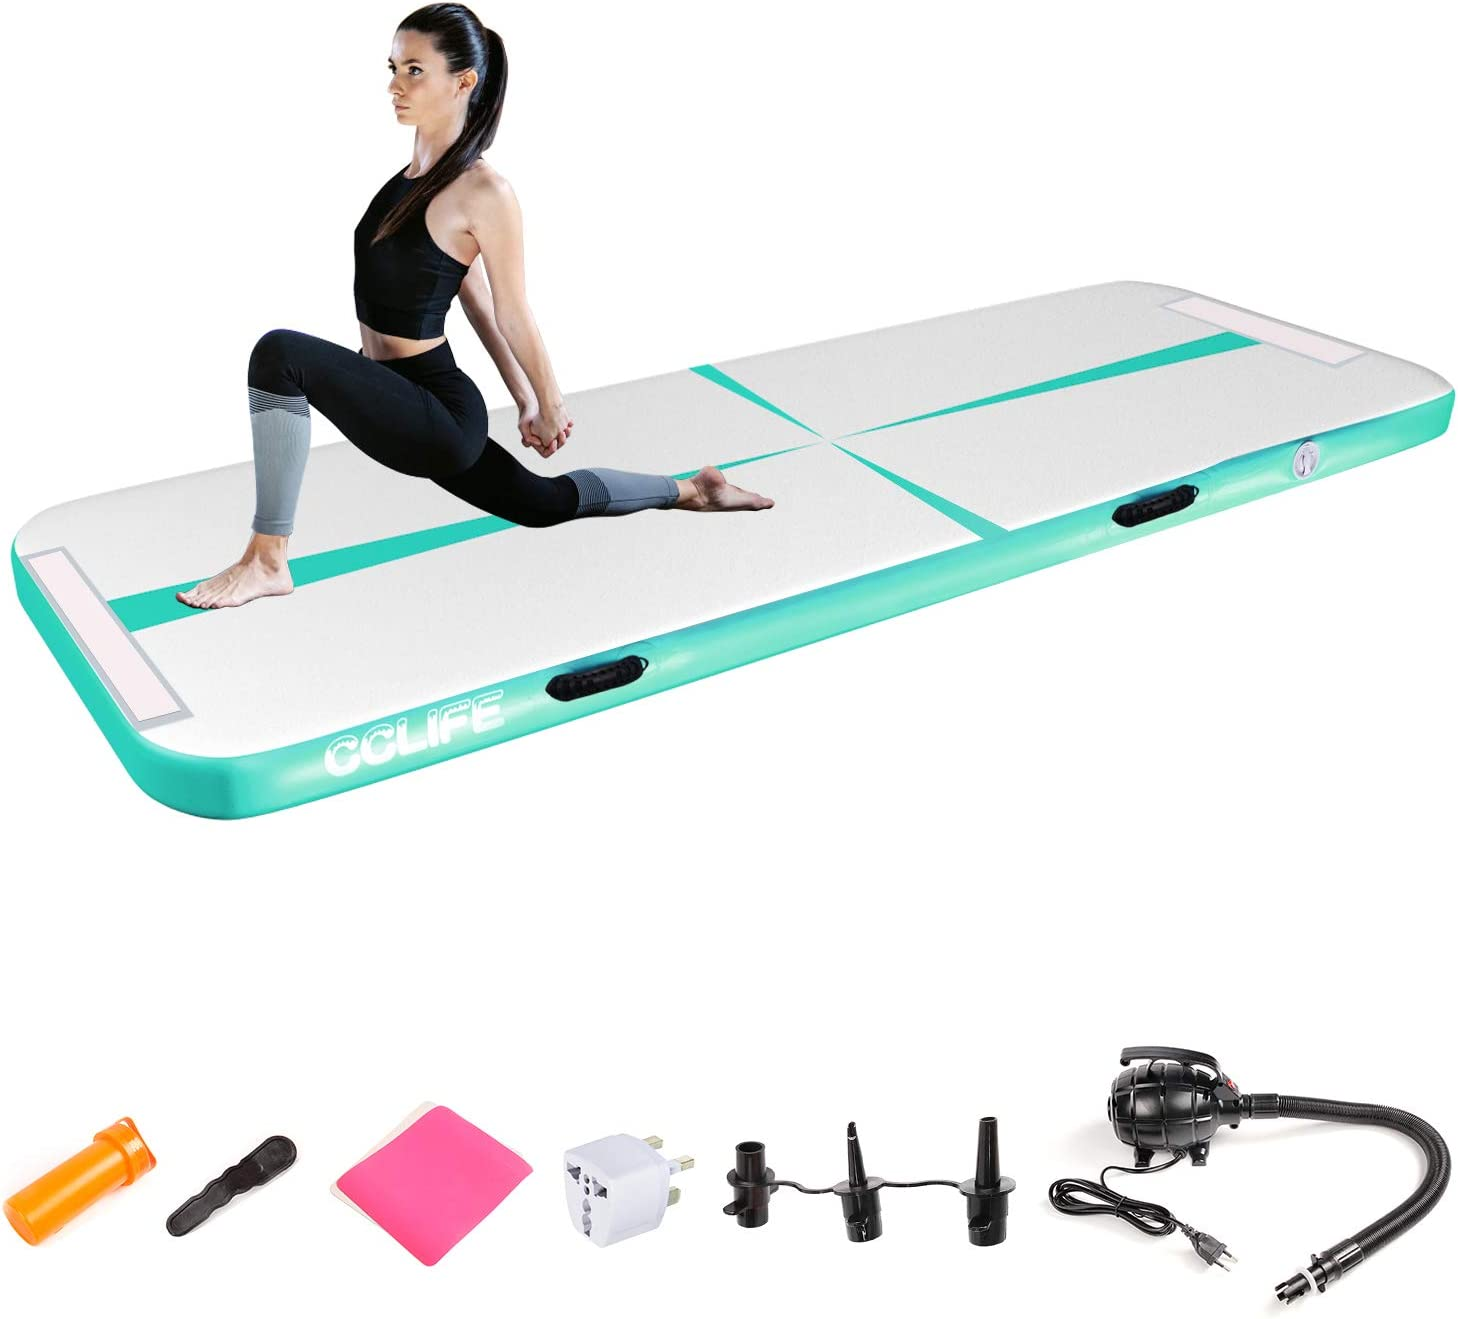 CNSPORT Aufblasbare Air Track gymnastikmatte Yogamatte Camping Trainingsmatte